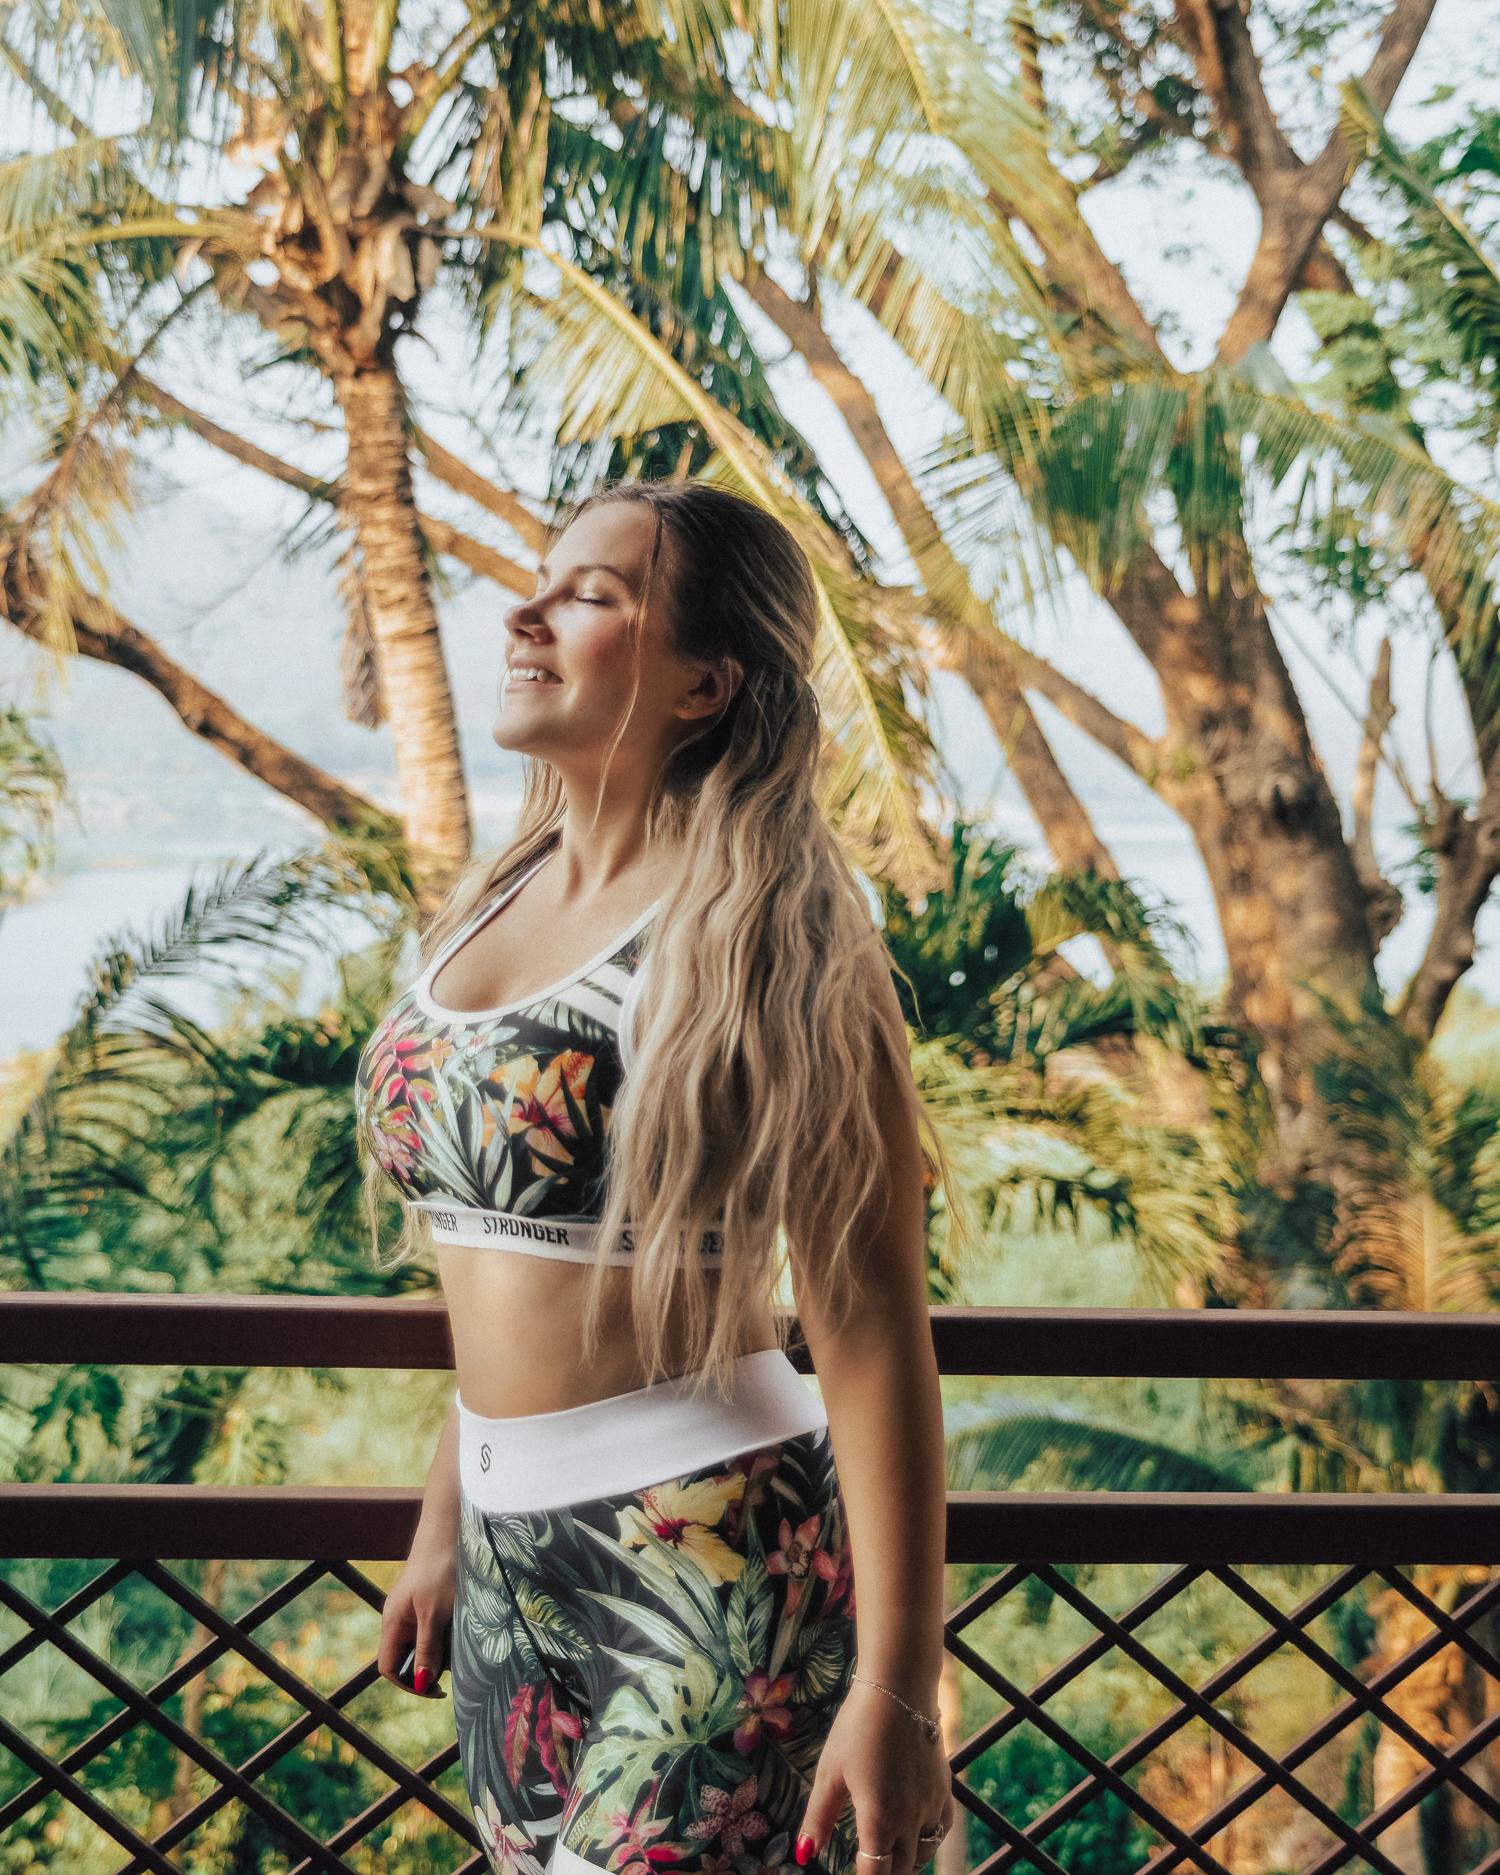 Stronger Vietnam Gym Tights & Sports Bra